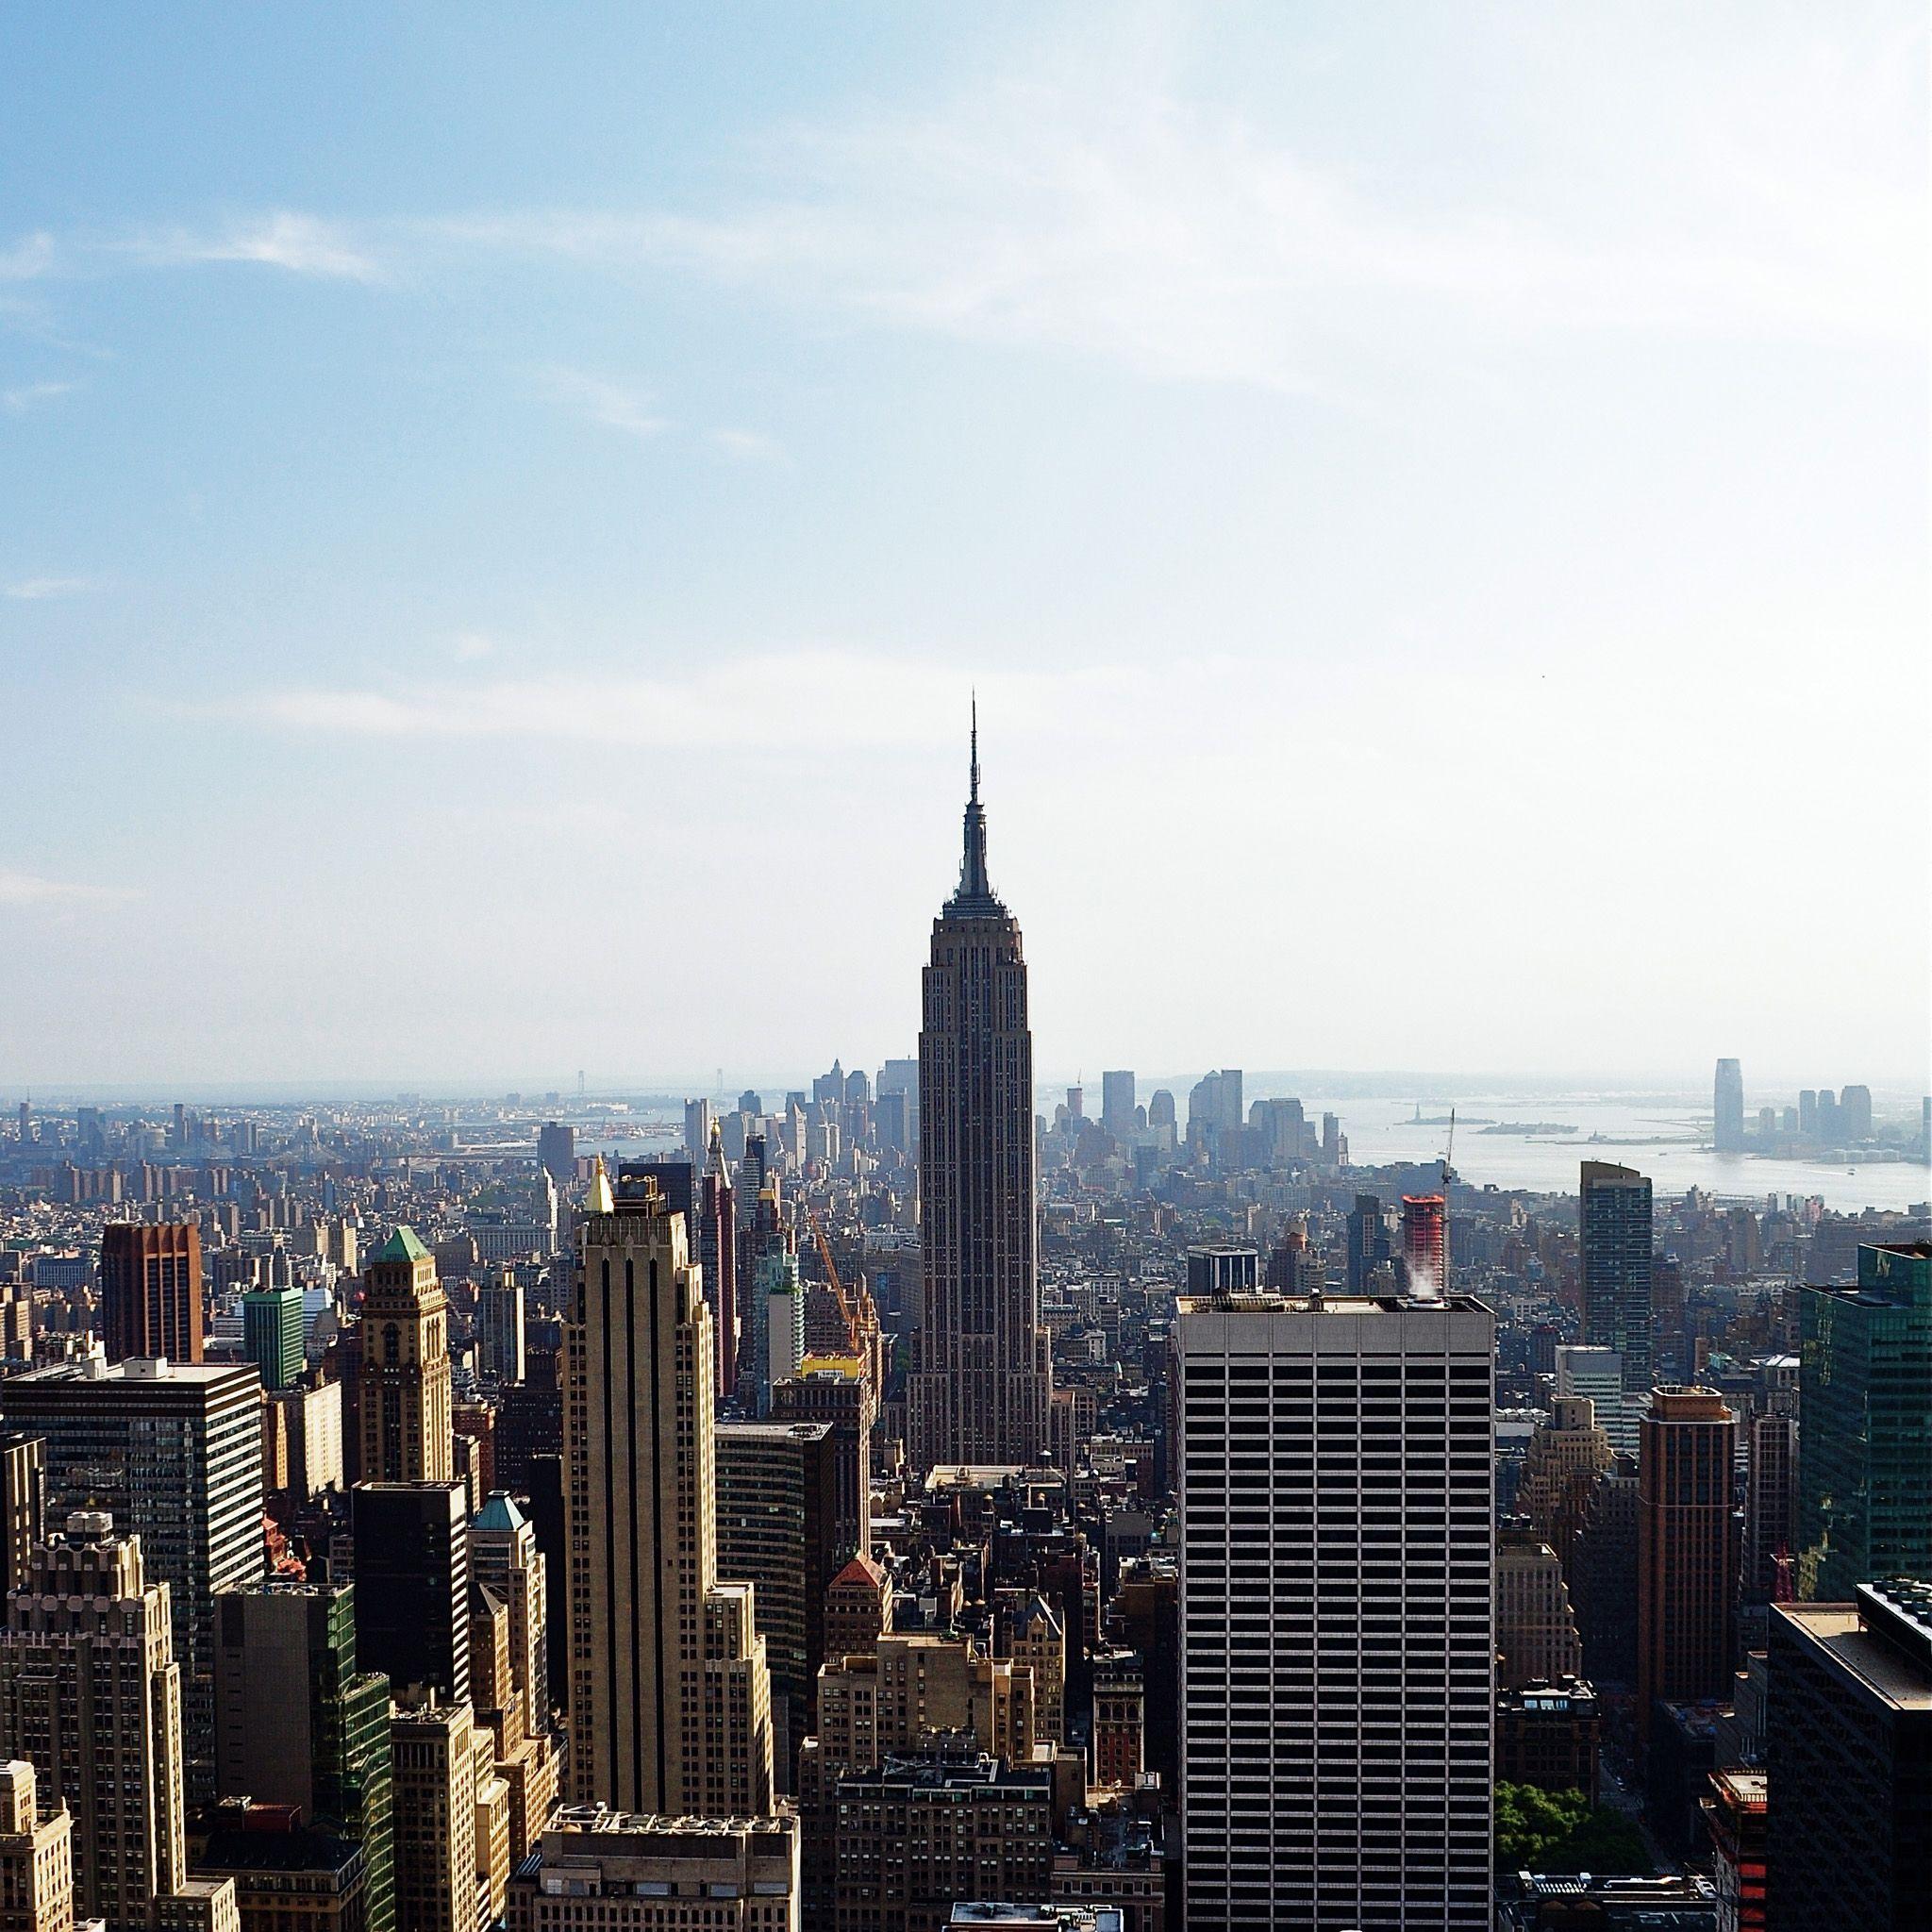 Empire State Building Ipad Wallpaper New York City Images New York City Ipad Air Wallpaper